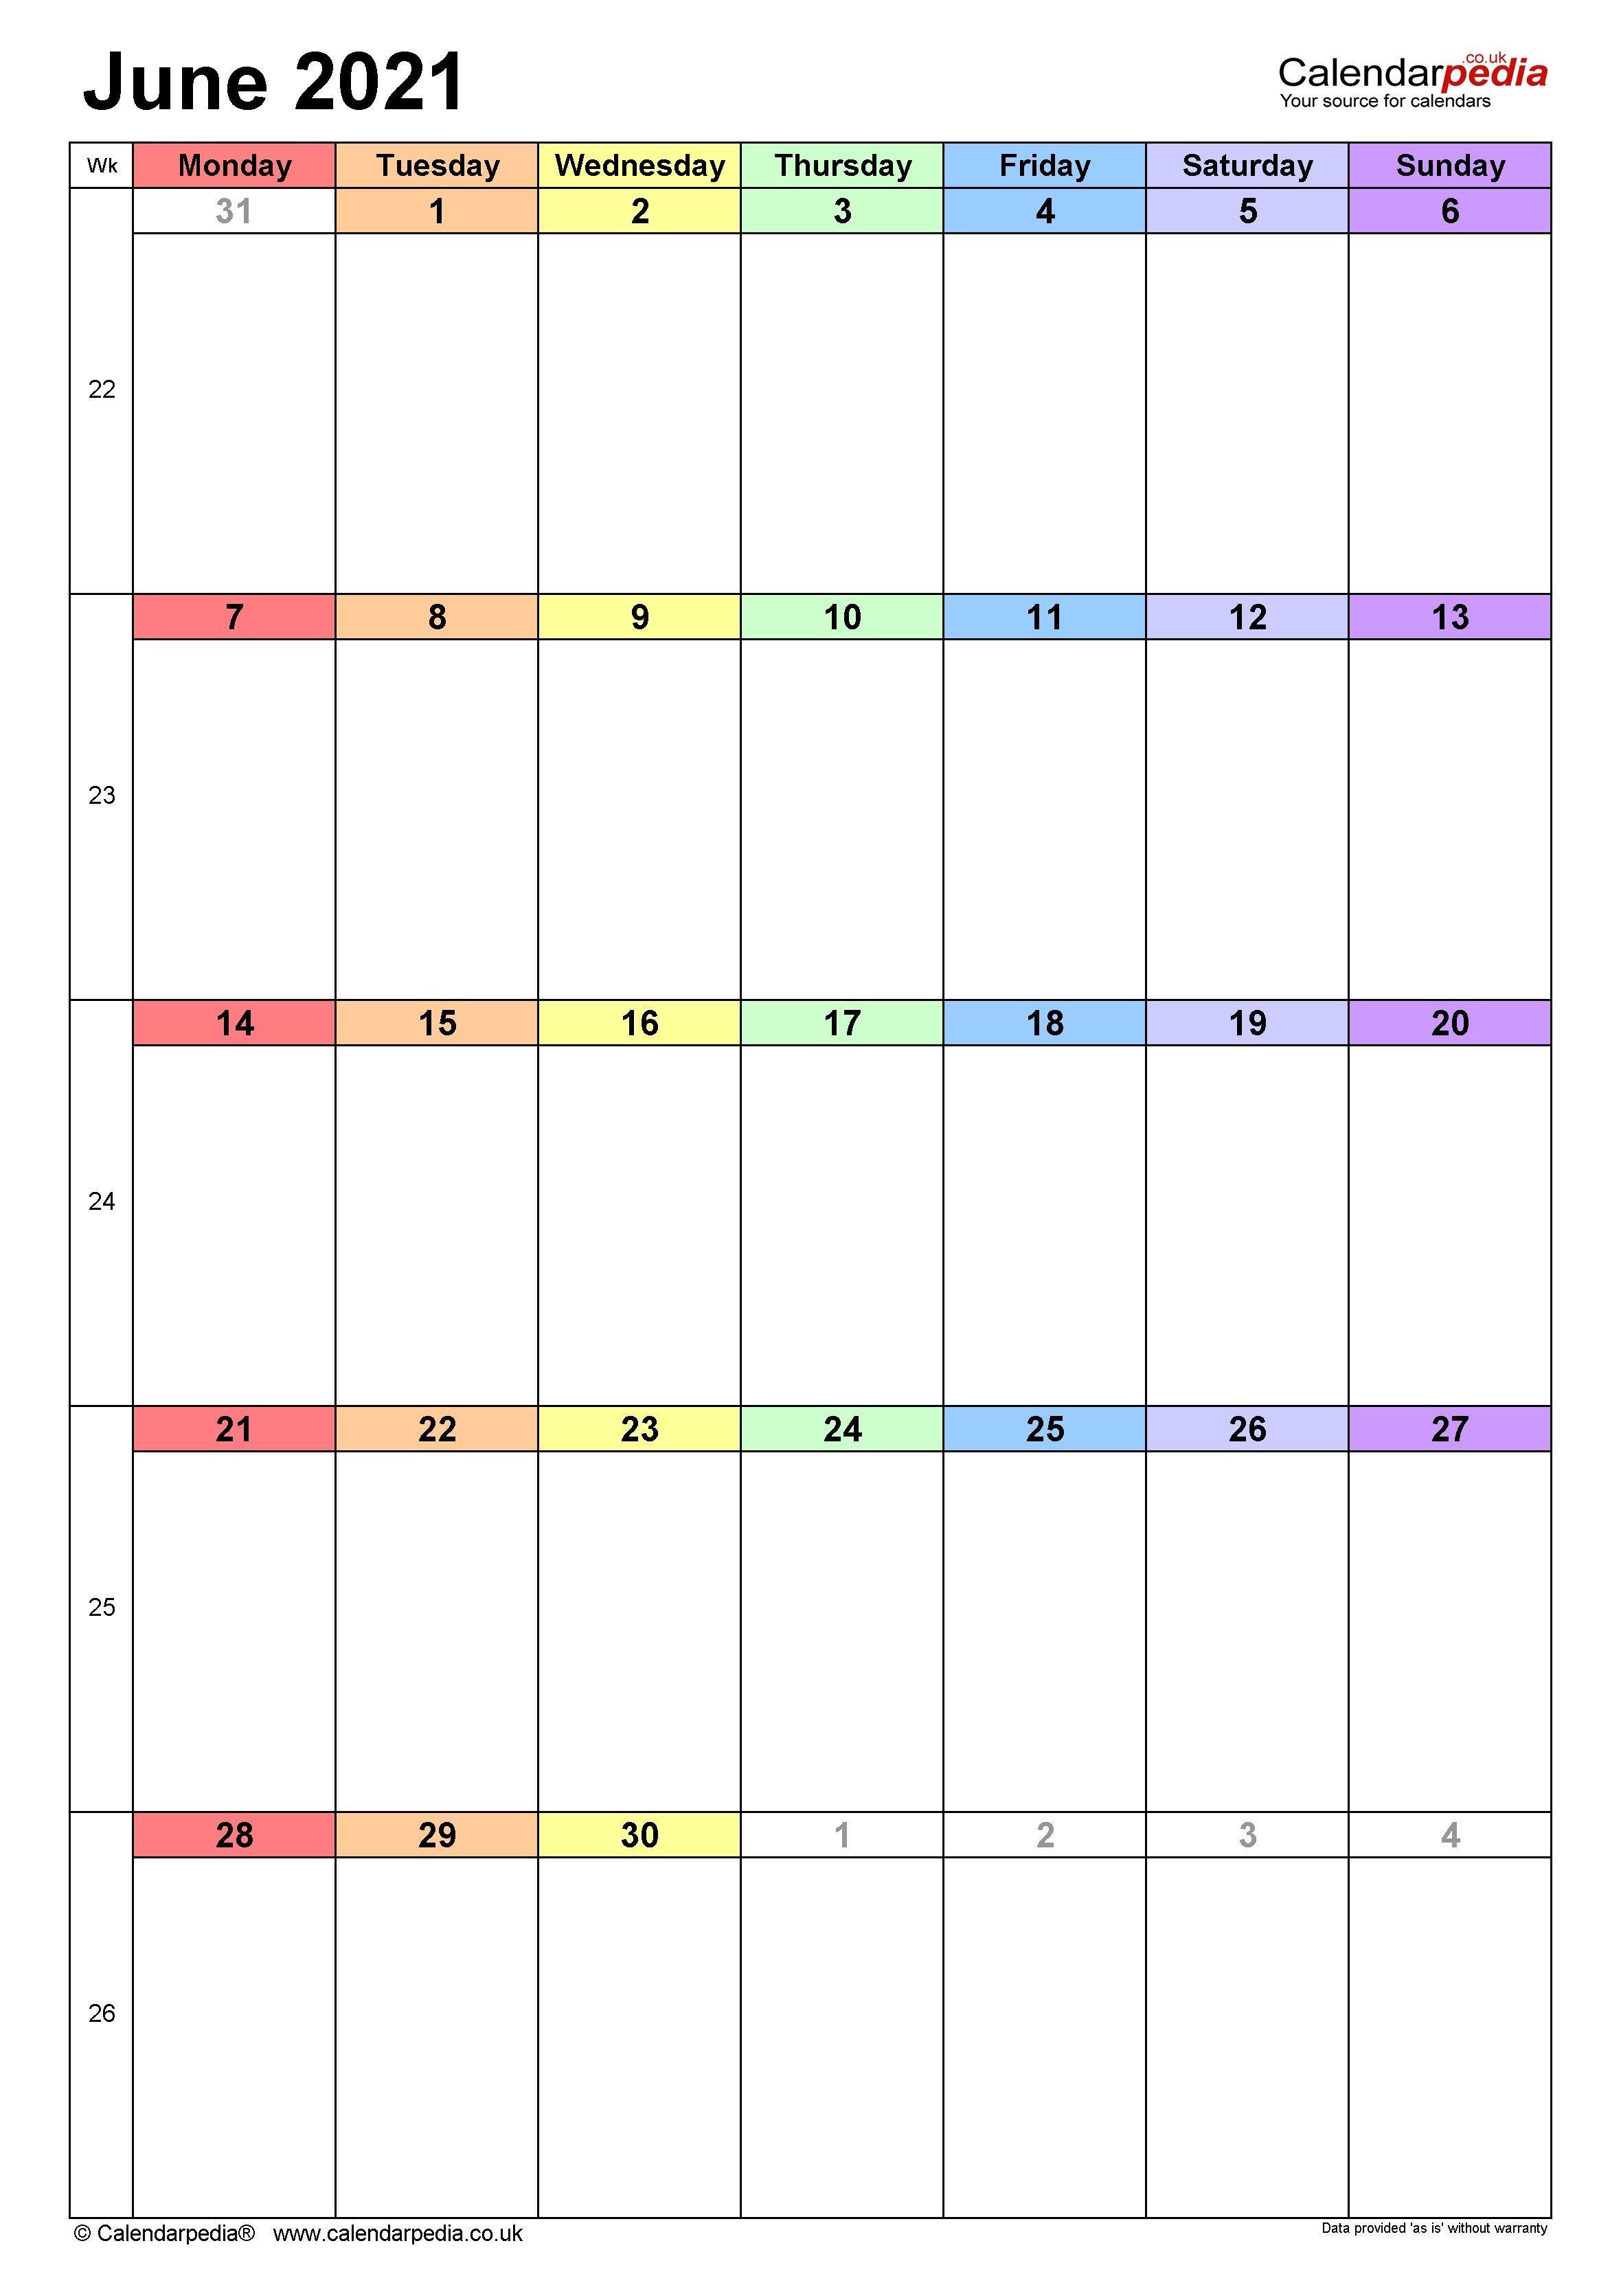 Calendar June 2021 Uk With Excel, Word And Pdf Templates June 2021 Blank Calendar Printable